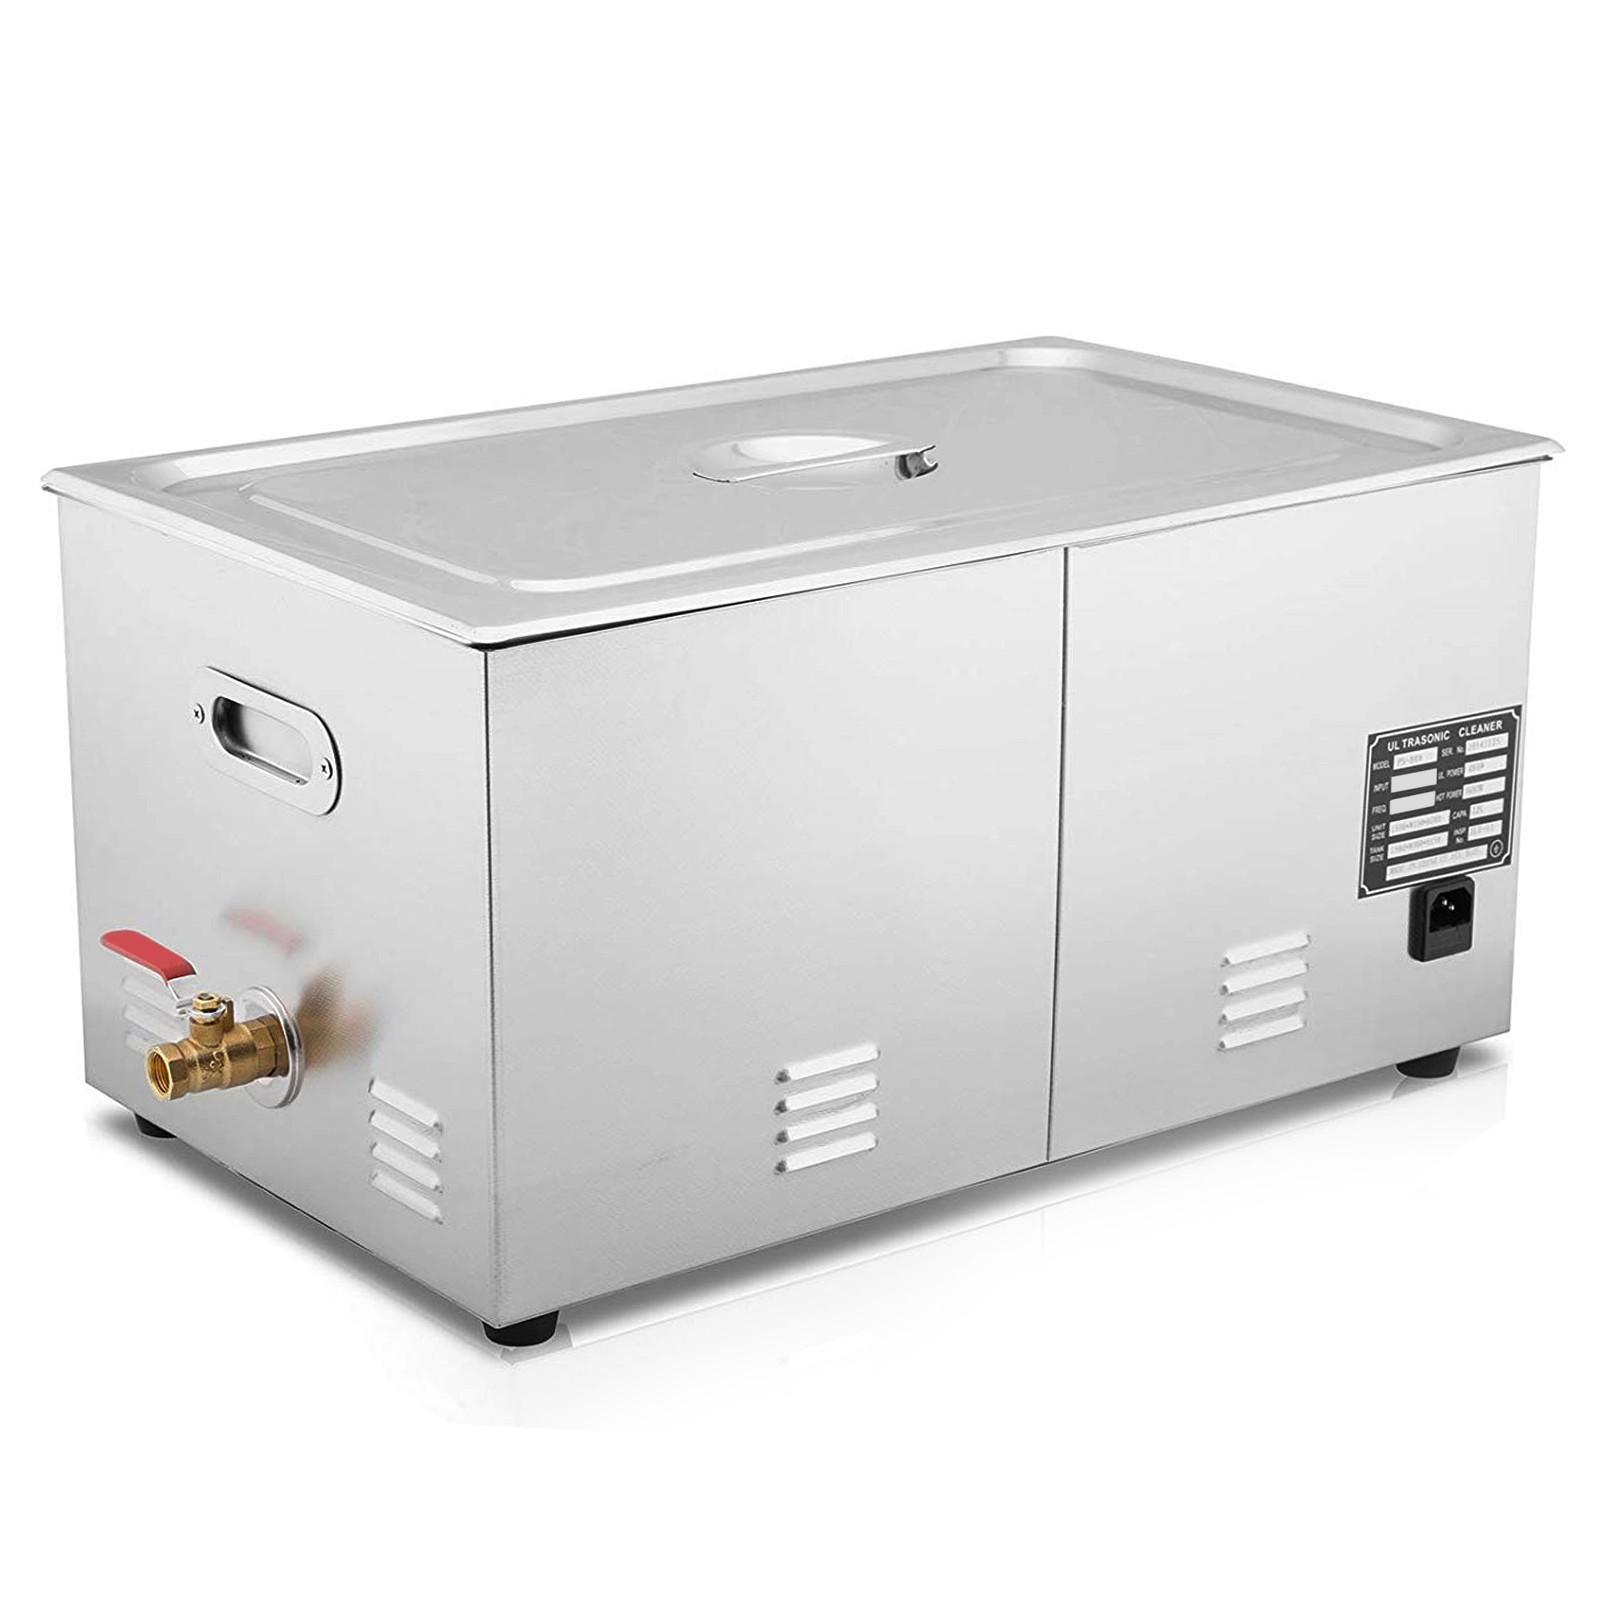 Vaschetta-Vasca-Ultrasuoni-Lavatrice-Pulitore-Ad-Ultrasuoni miniatura 100